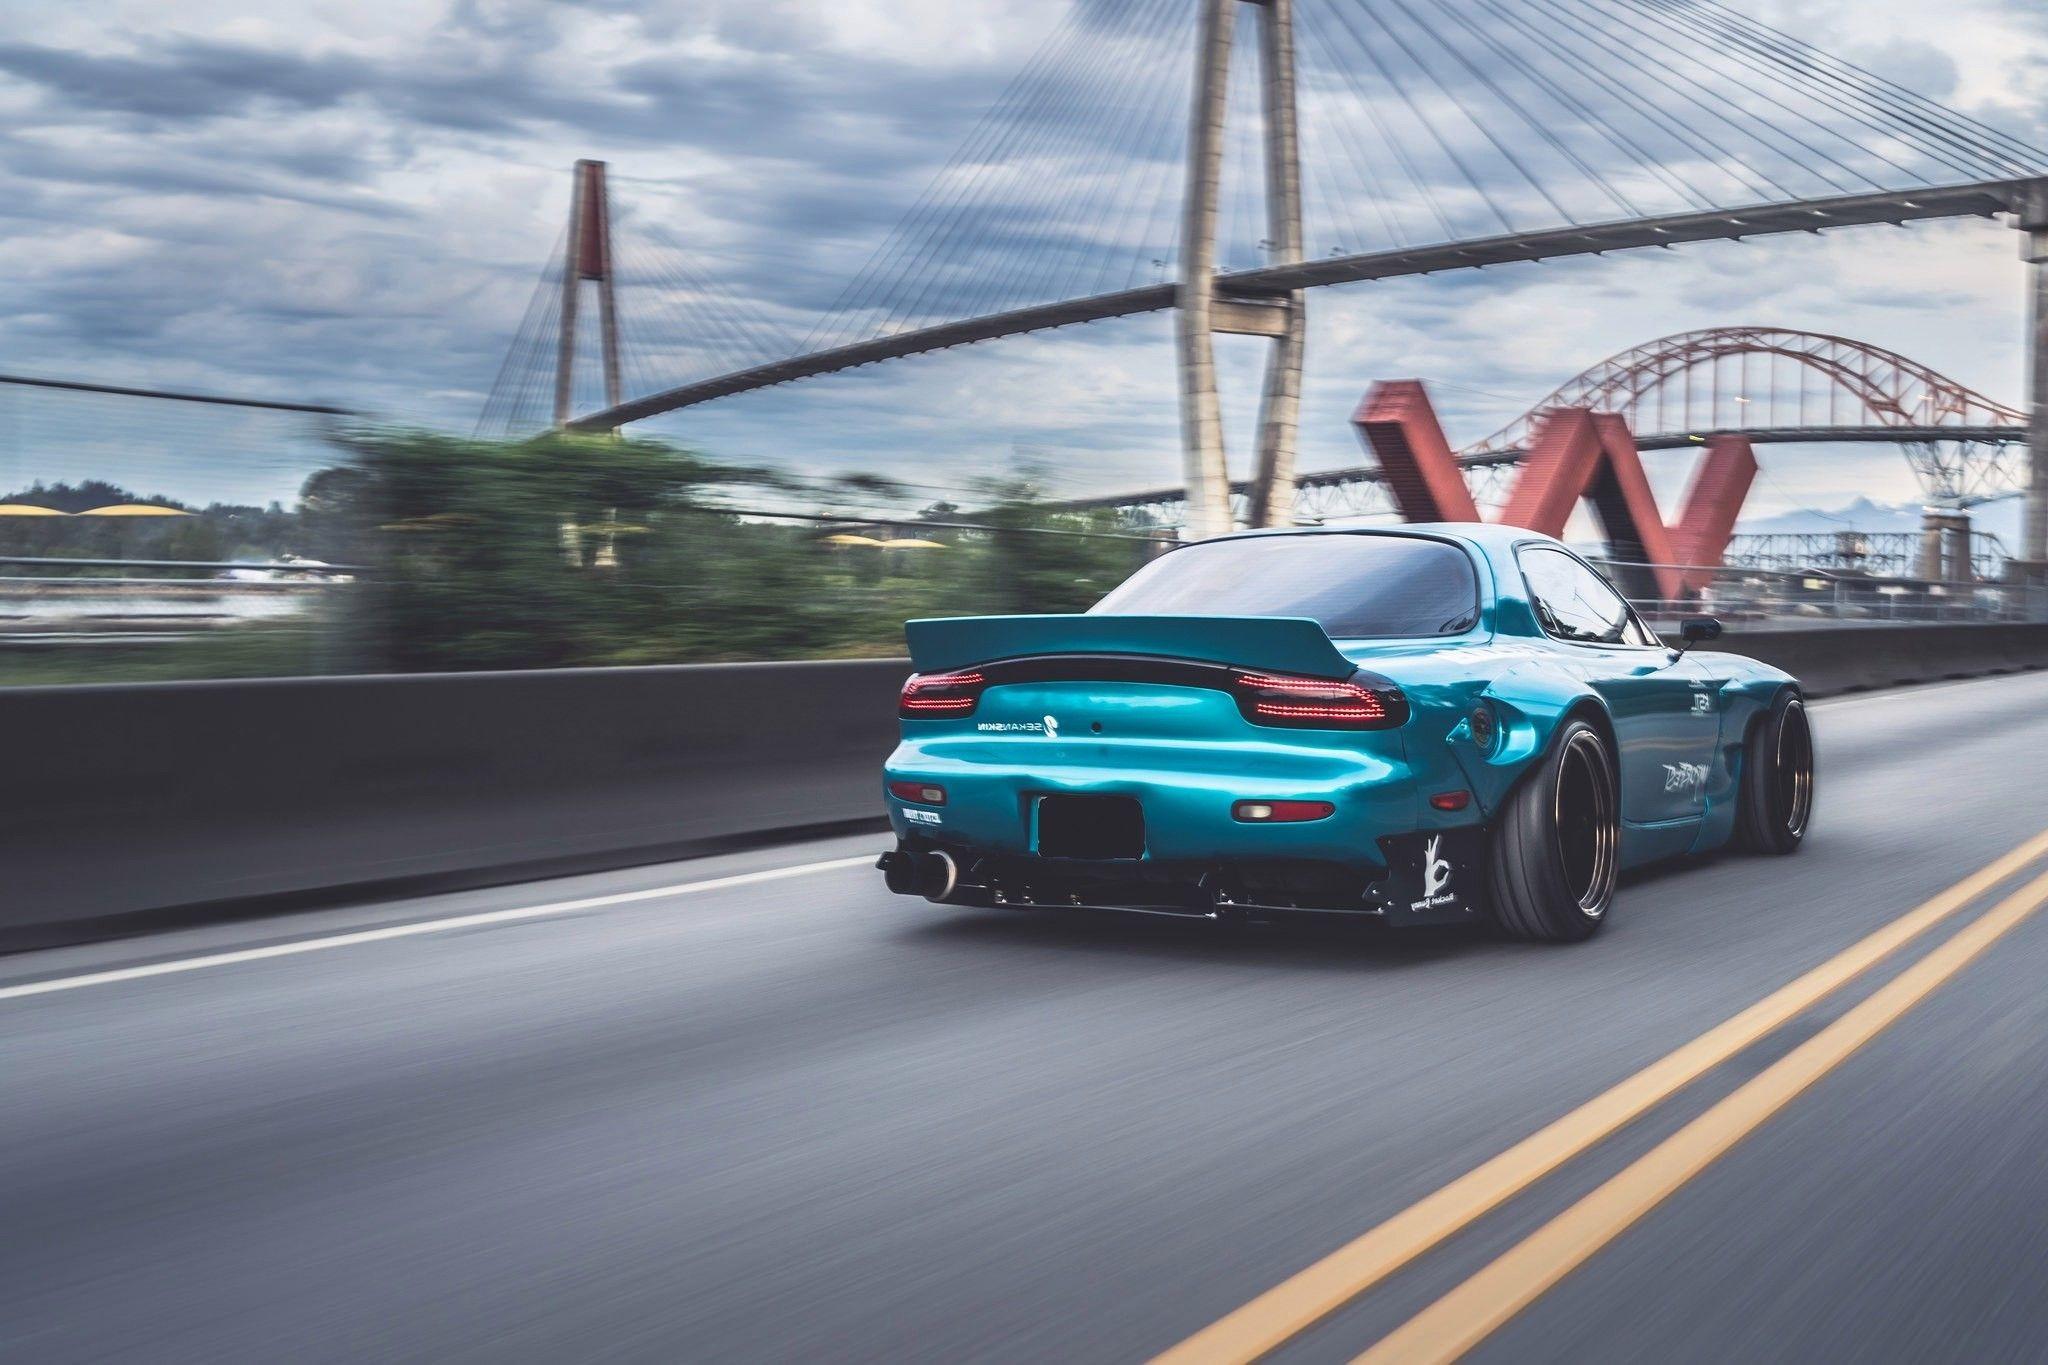 48x1365 Sports Car Mazda Rx 7 Blue Cars Bridge Rocket Rocket Bunny Rx7 Rear 48x1365 Wallpaper Teahub Io